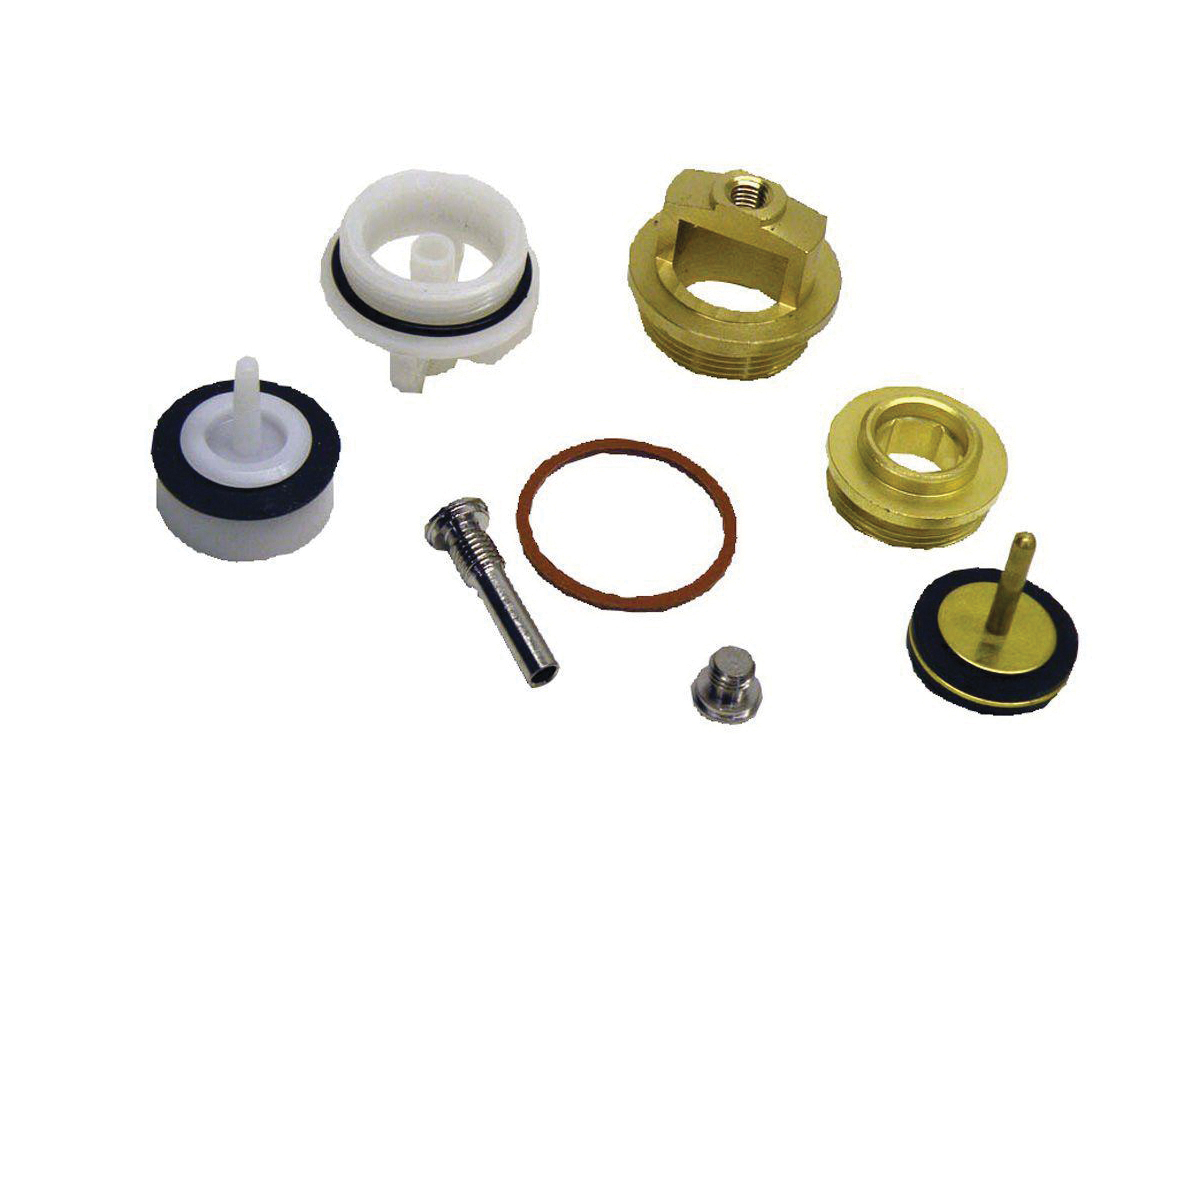 Speakman® RPG05-0520 Vacuum Breaker Hub Repair Kit, For Use With Service Sink Faucet, Plastic